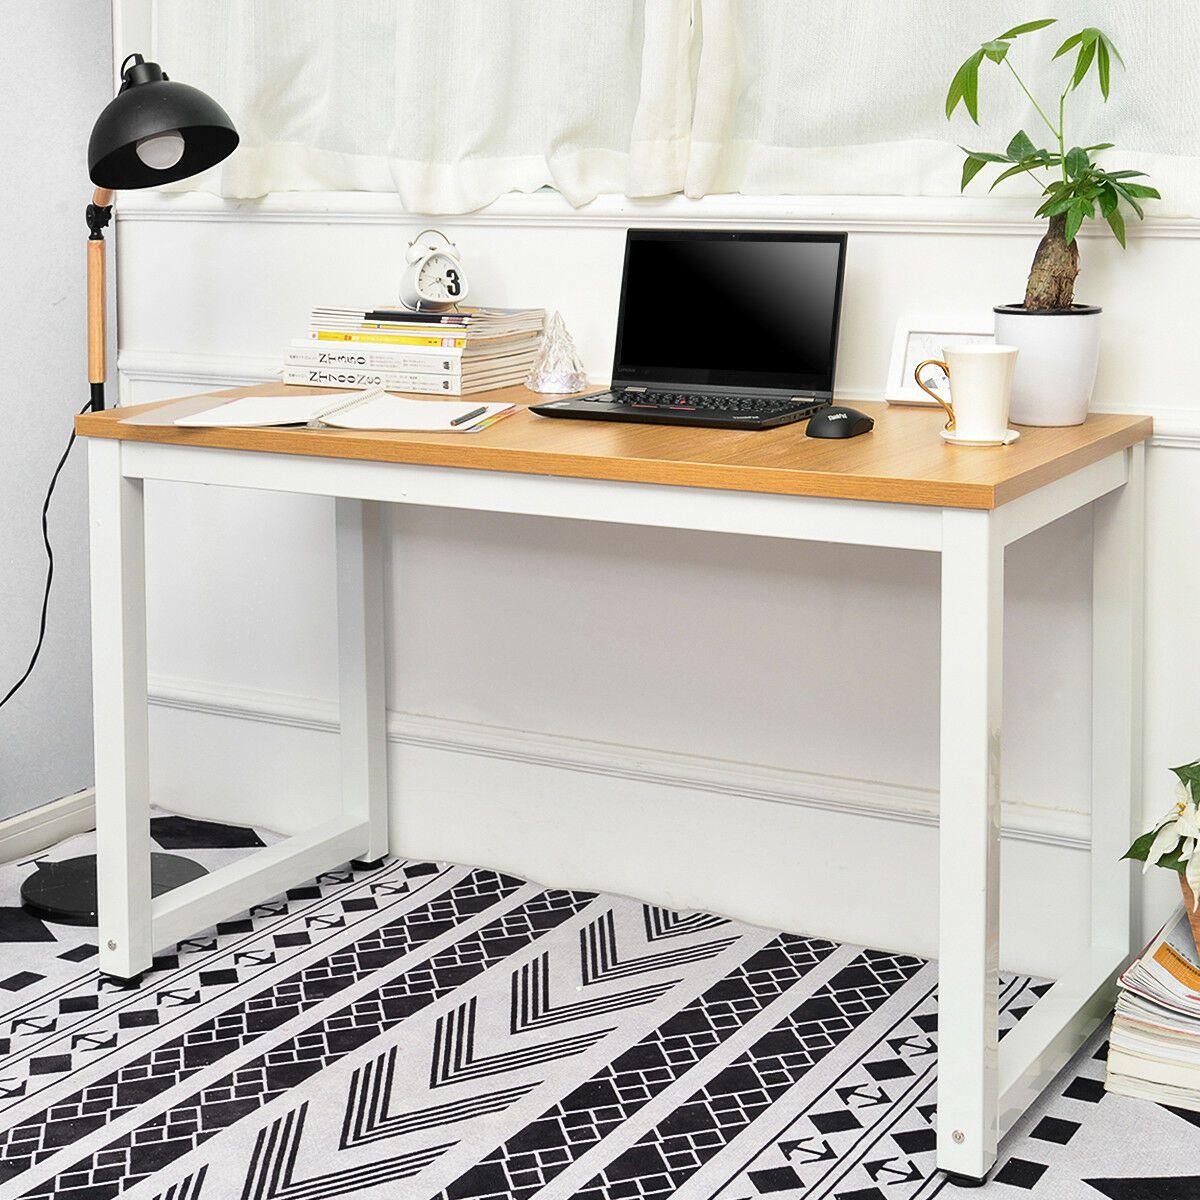 Details About Computer Desk Office Study Desk Computer Pc Laptop Table Workstation 120 X 60 Cm In 2020 Office Desk Simple Computer Desk Computer Desks For Home